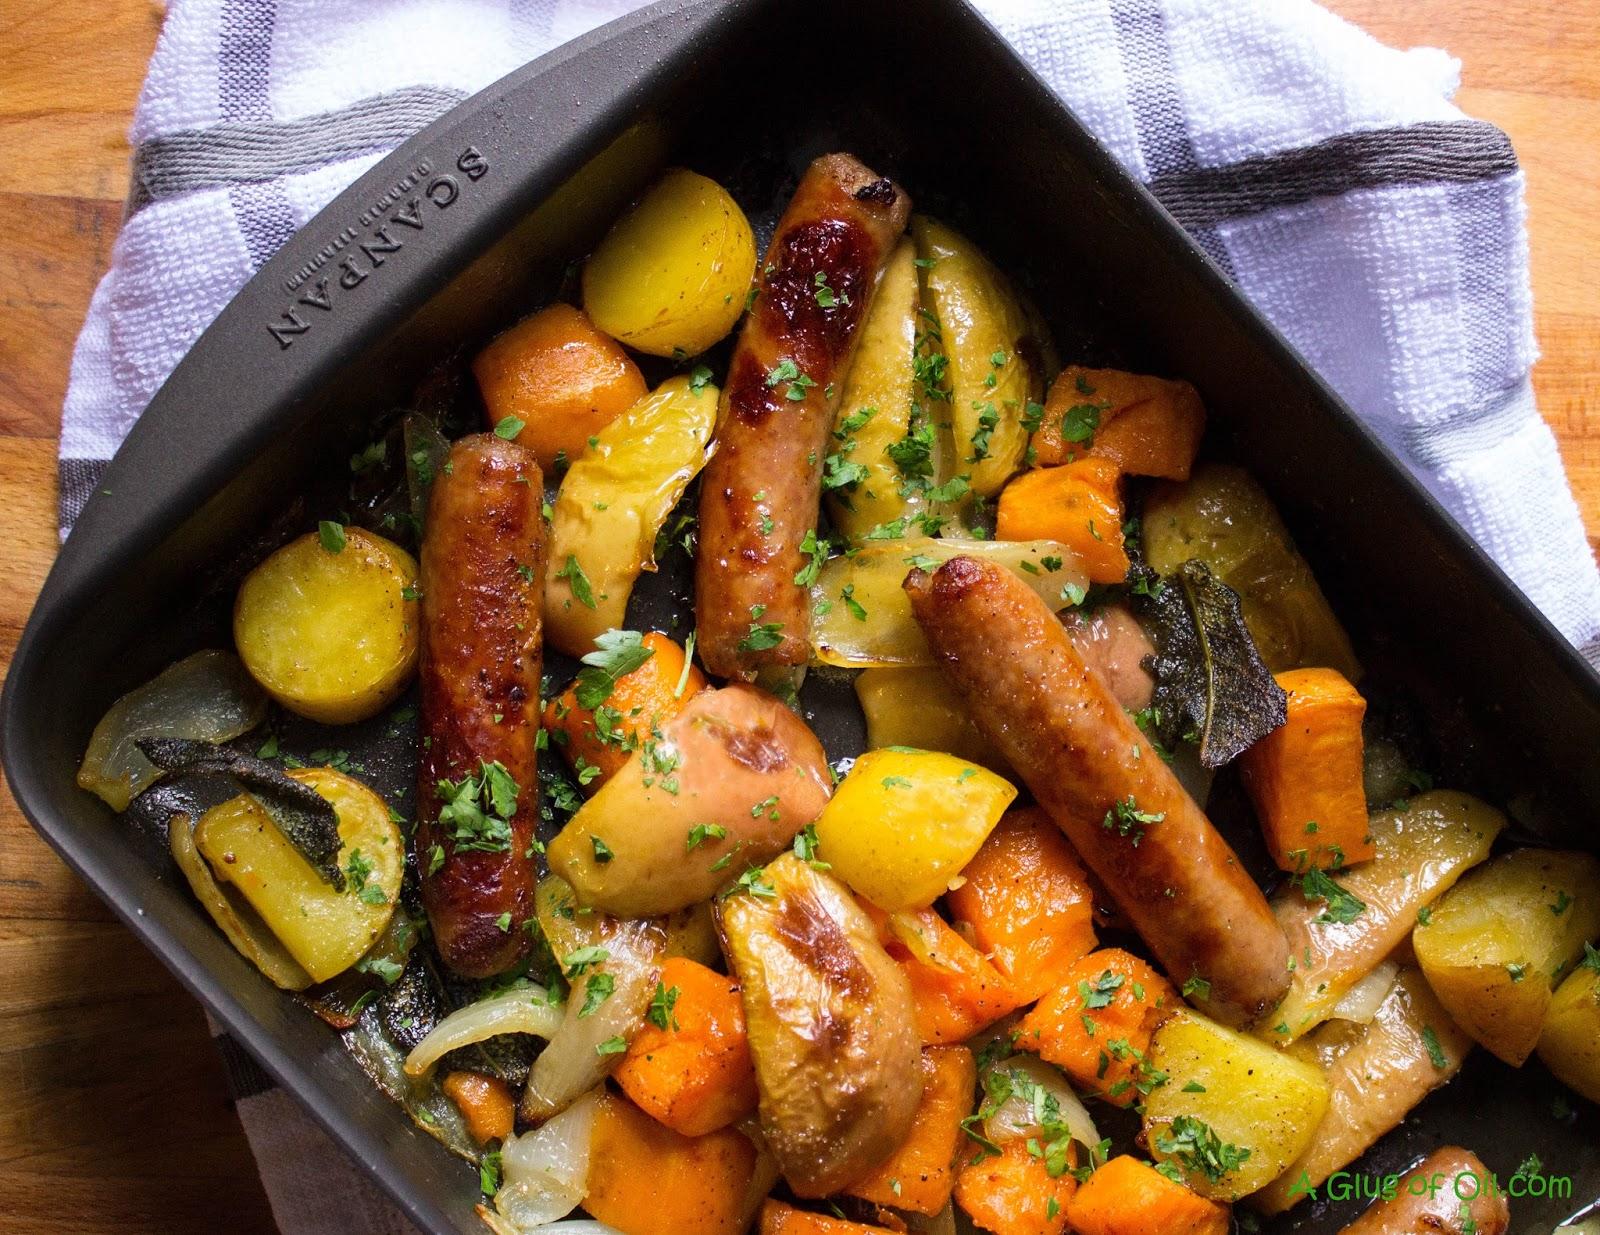 Sausage Sweet Potato and Apple Tray Bake